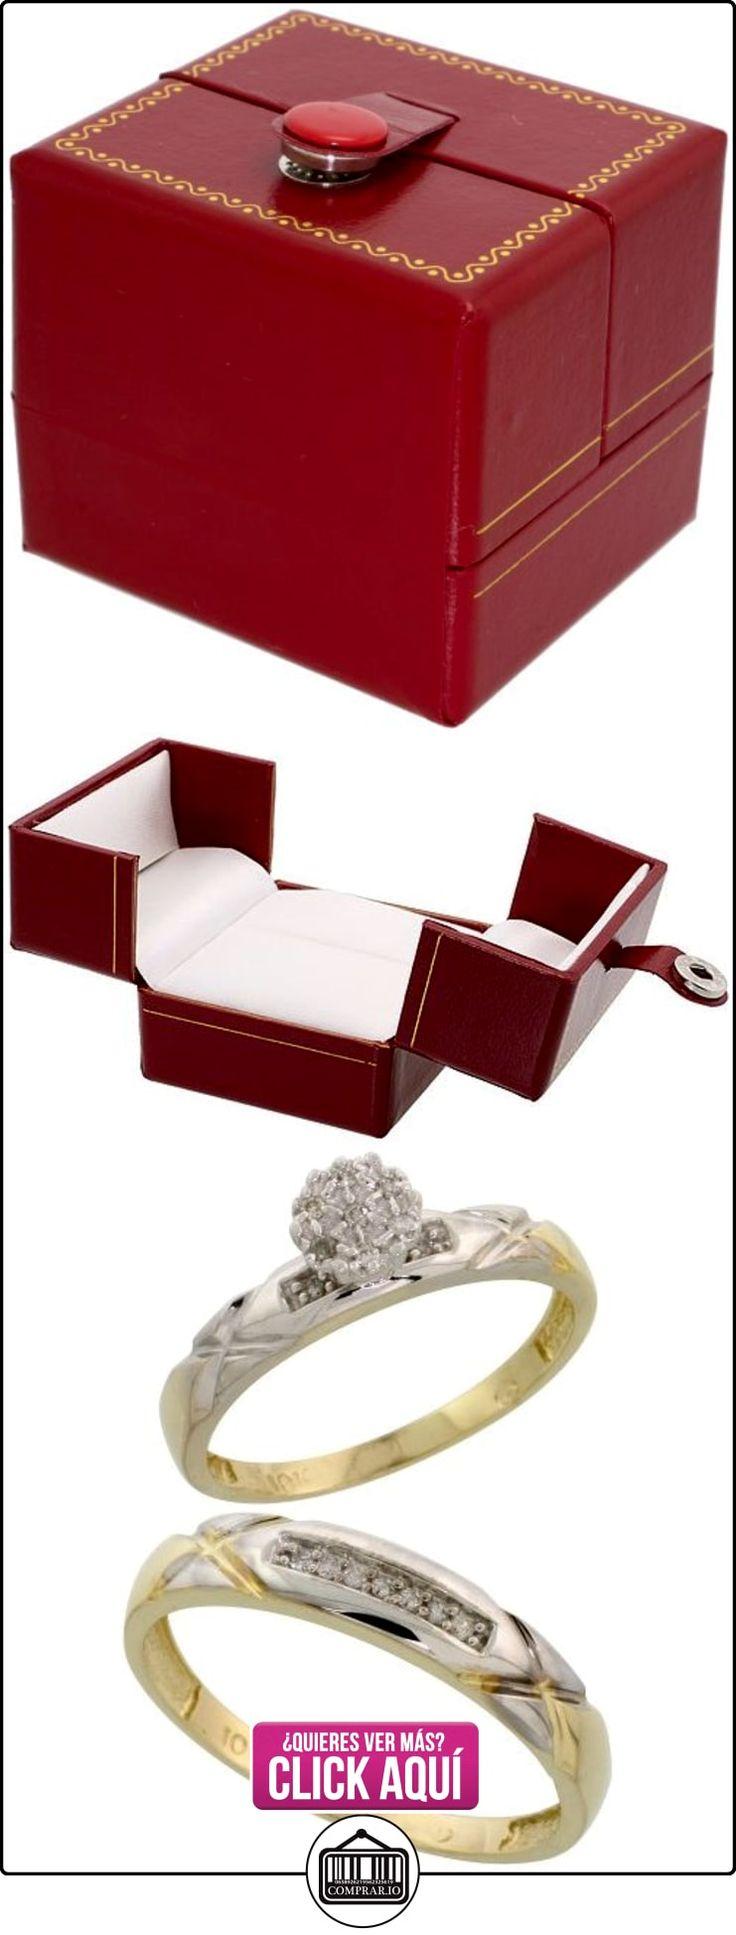 Revoni - Anillo de compromiso de oro amarillo  ✿ Joyas para hombres especiales - lujo ✿ ▬► Ver oferta: http://comprar.io/goto/B005M3EQ4Q